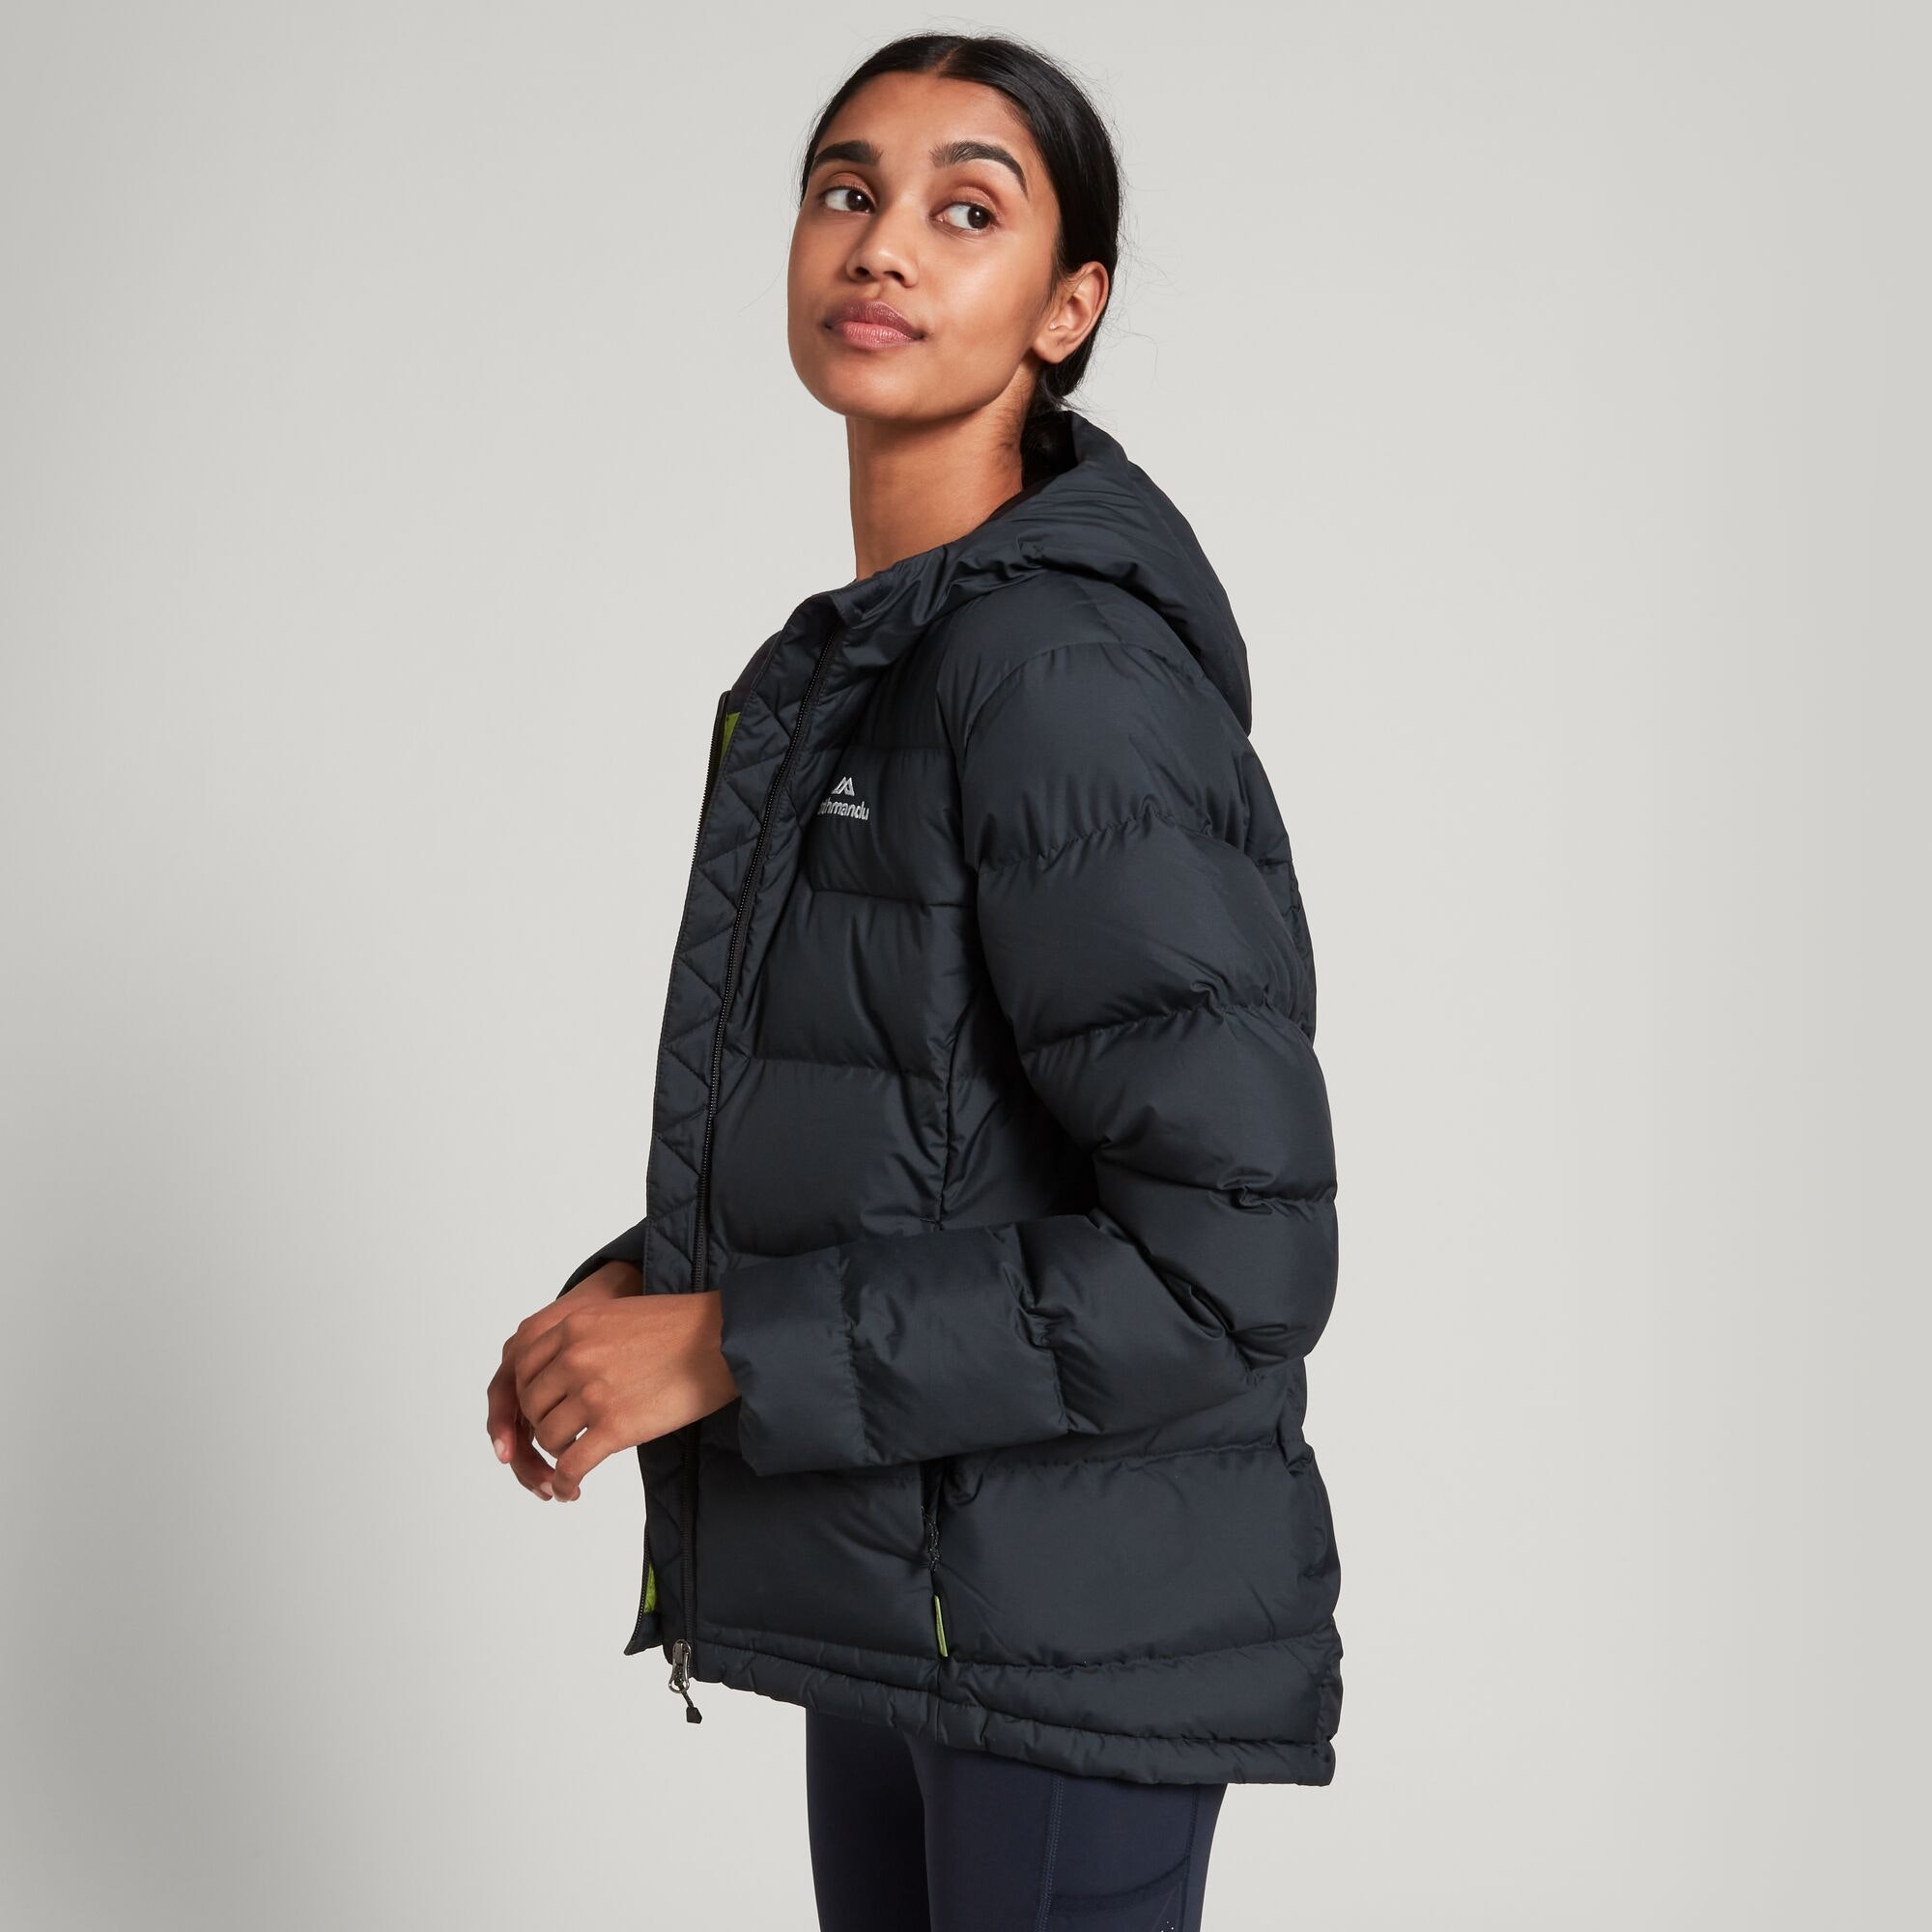 thumbnail 11 - NEW Kathmandu Epiq Womens Hooded Down Puffer 600 Fill Warm Outdoor Winter Jacket